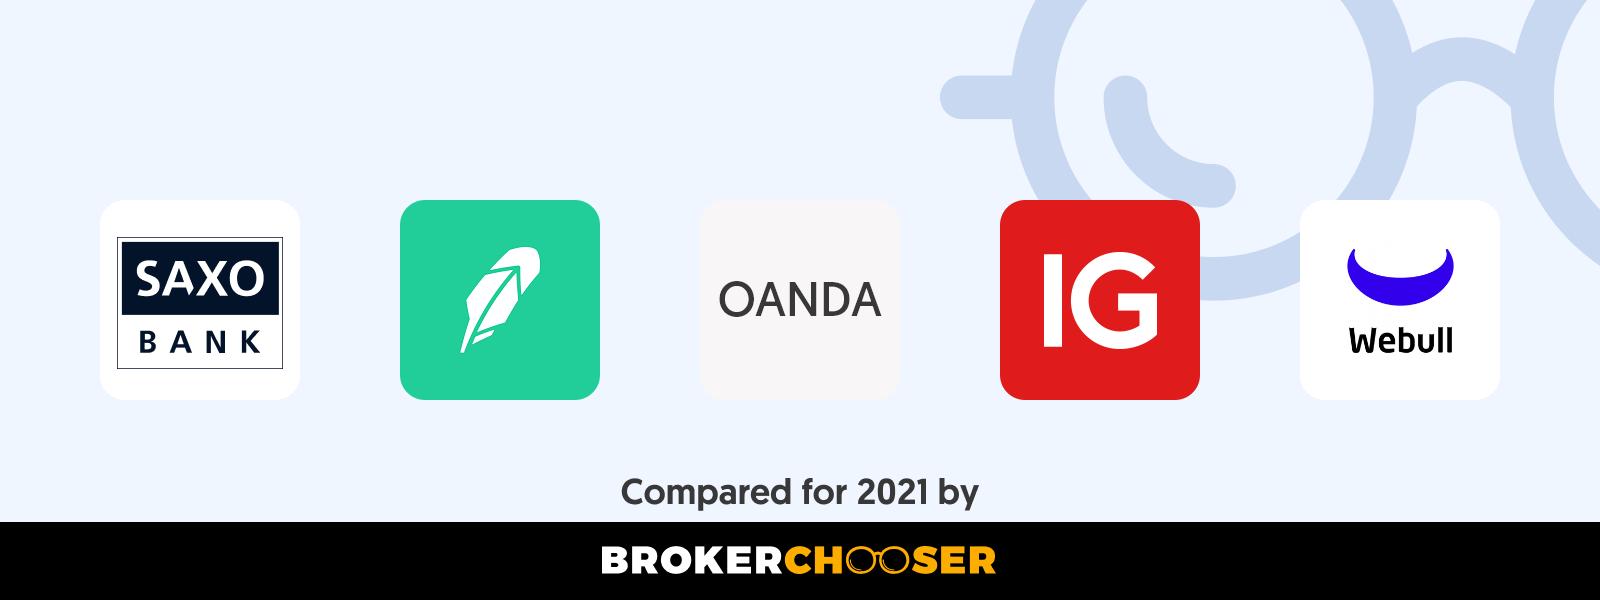 Best mobile trading platforms in 2021